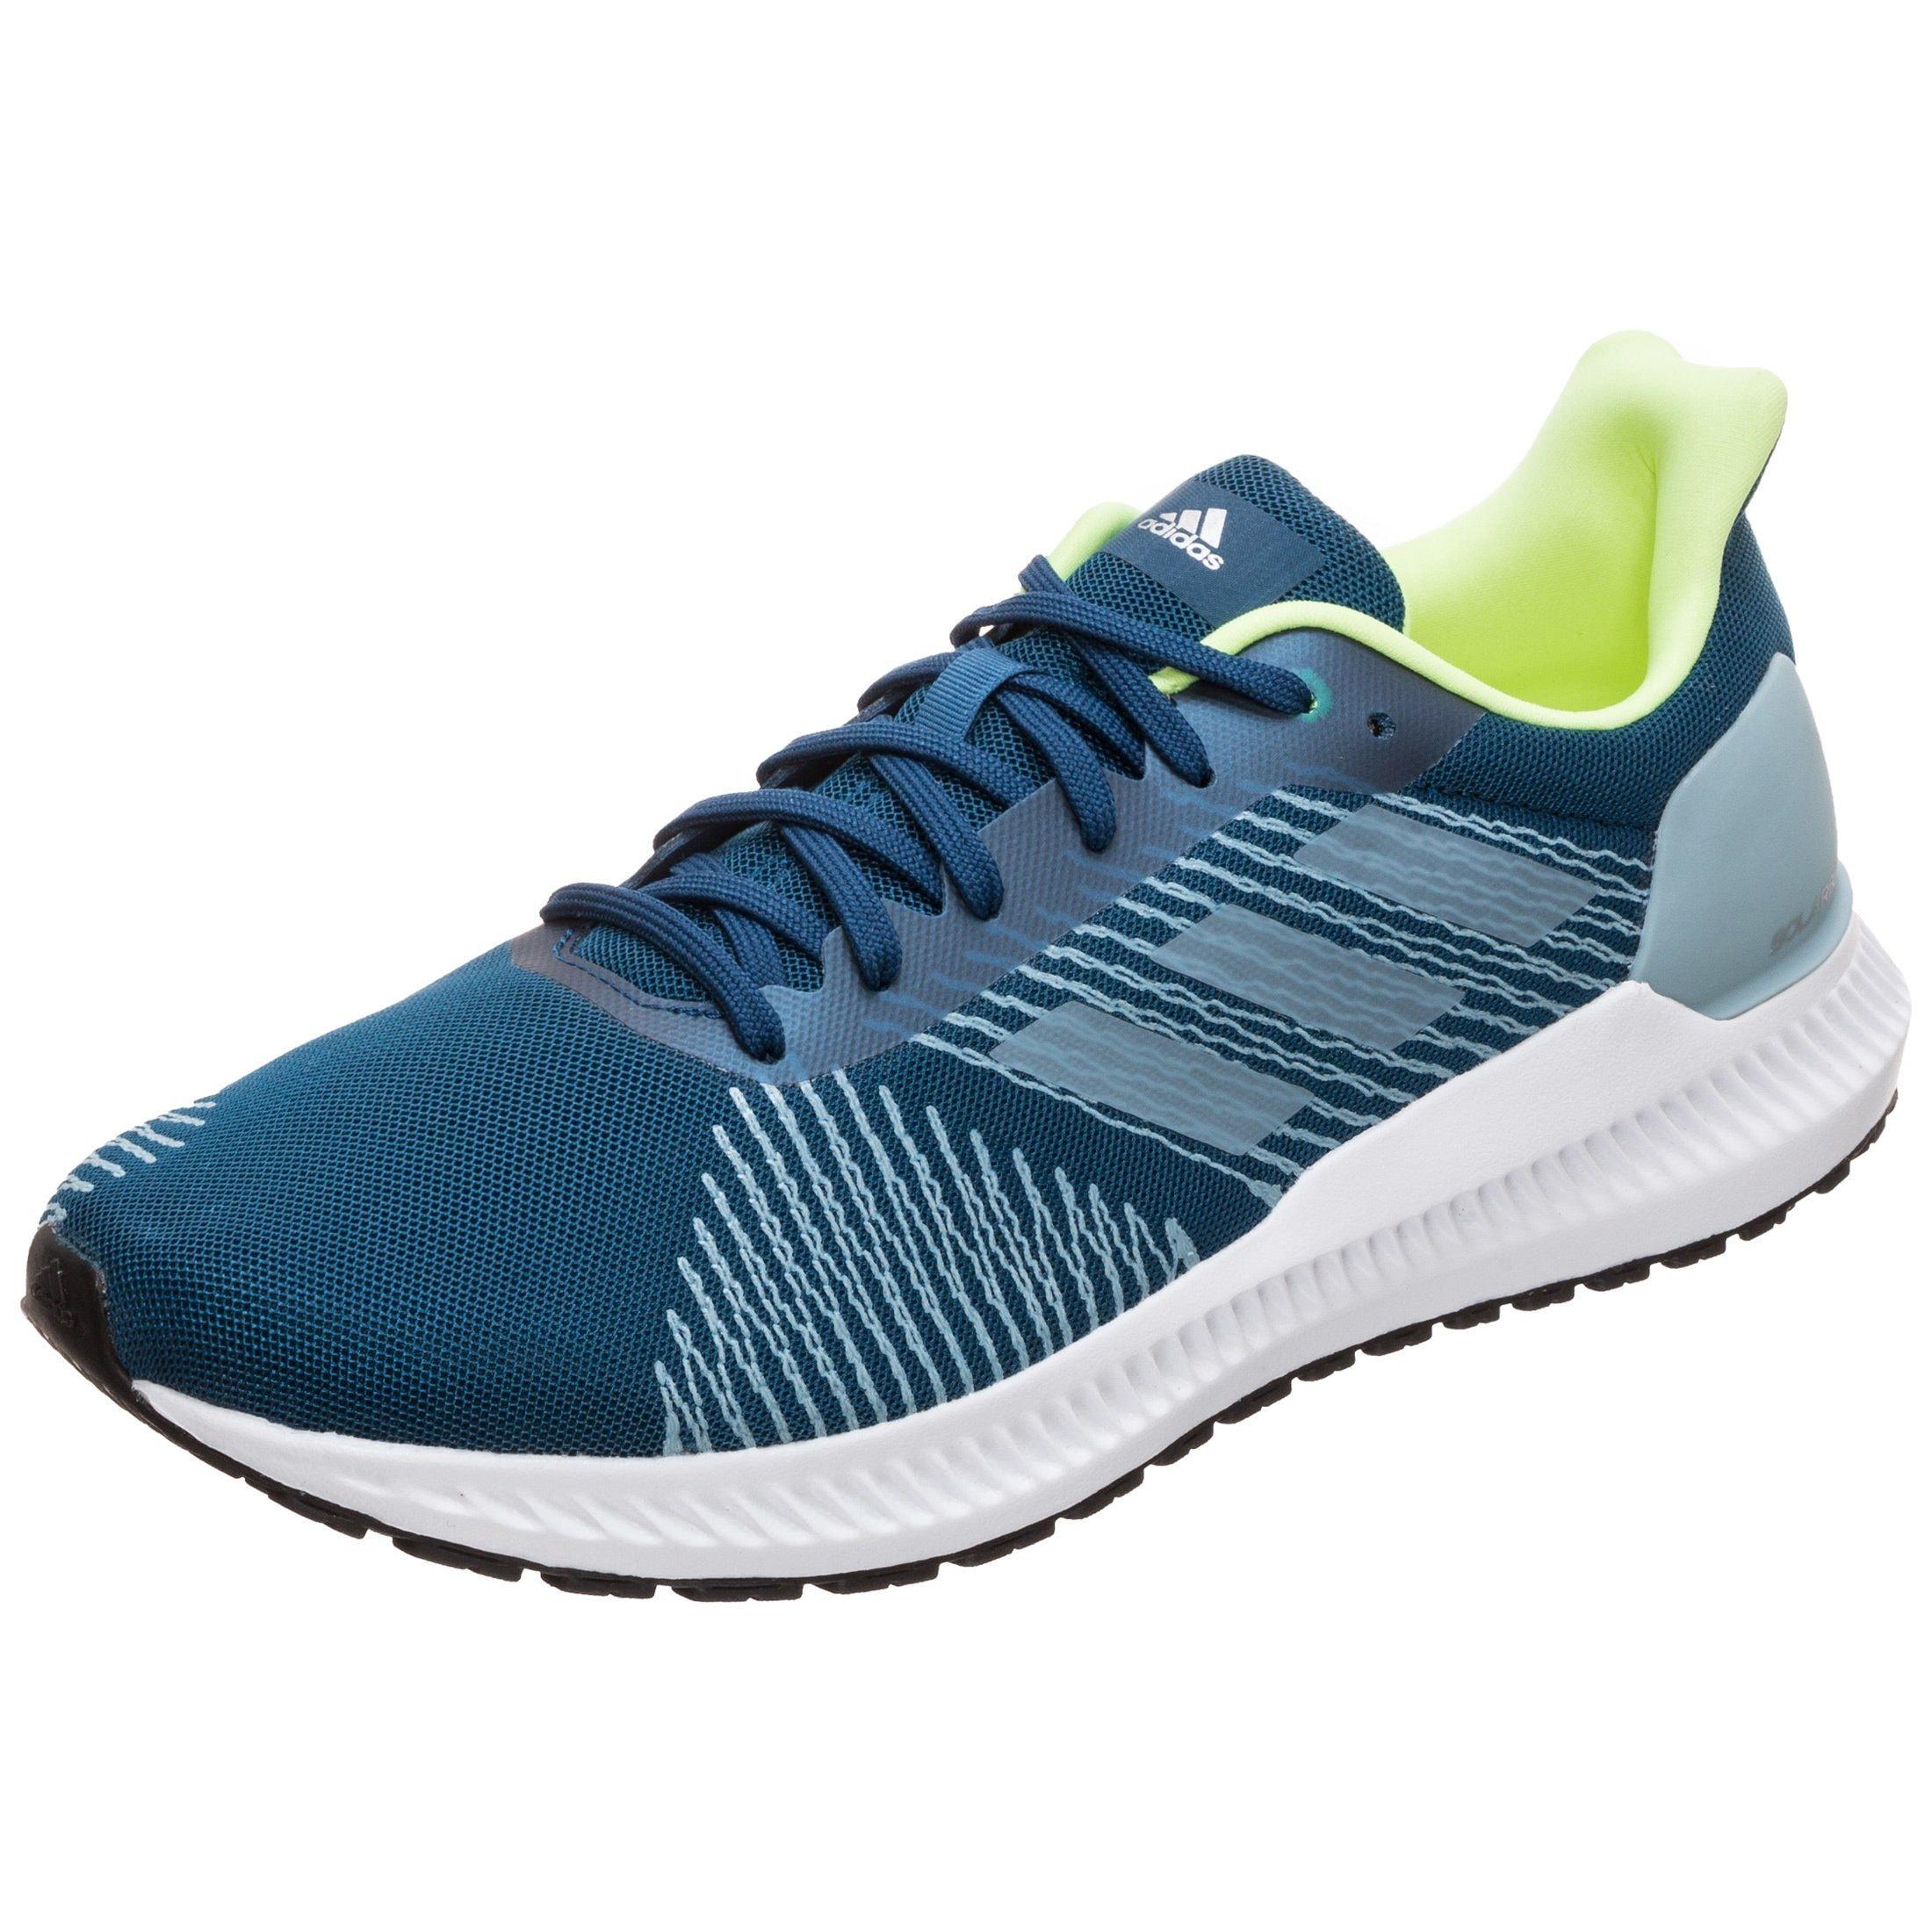 imwalking | Herren Adidas Laufschuh Duramo Lite 20 M1